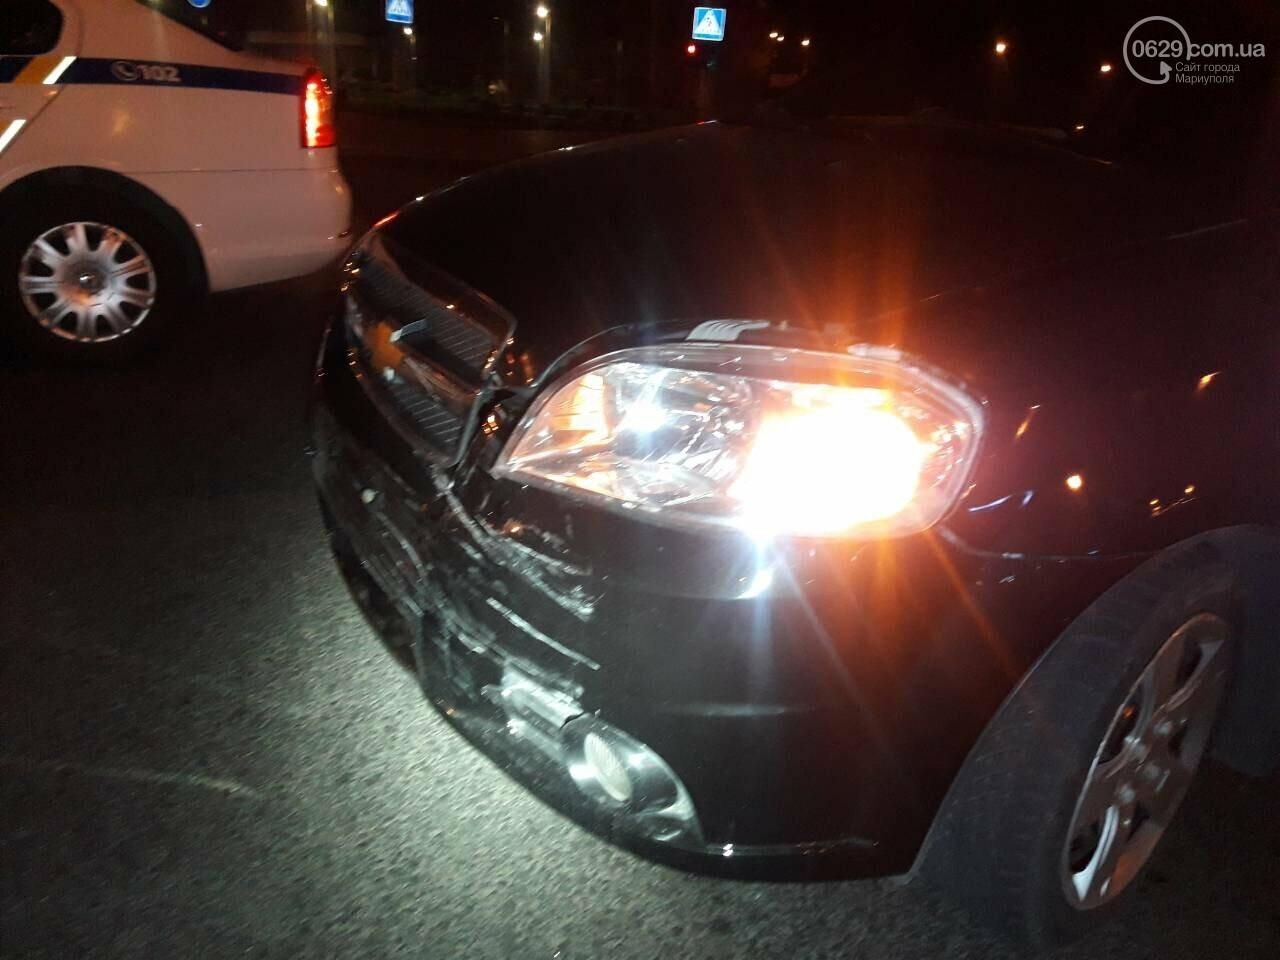 В центре Мариуполя столкнулись два автомобиля, — ФОТО, фото-10